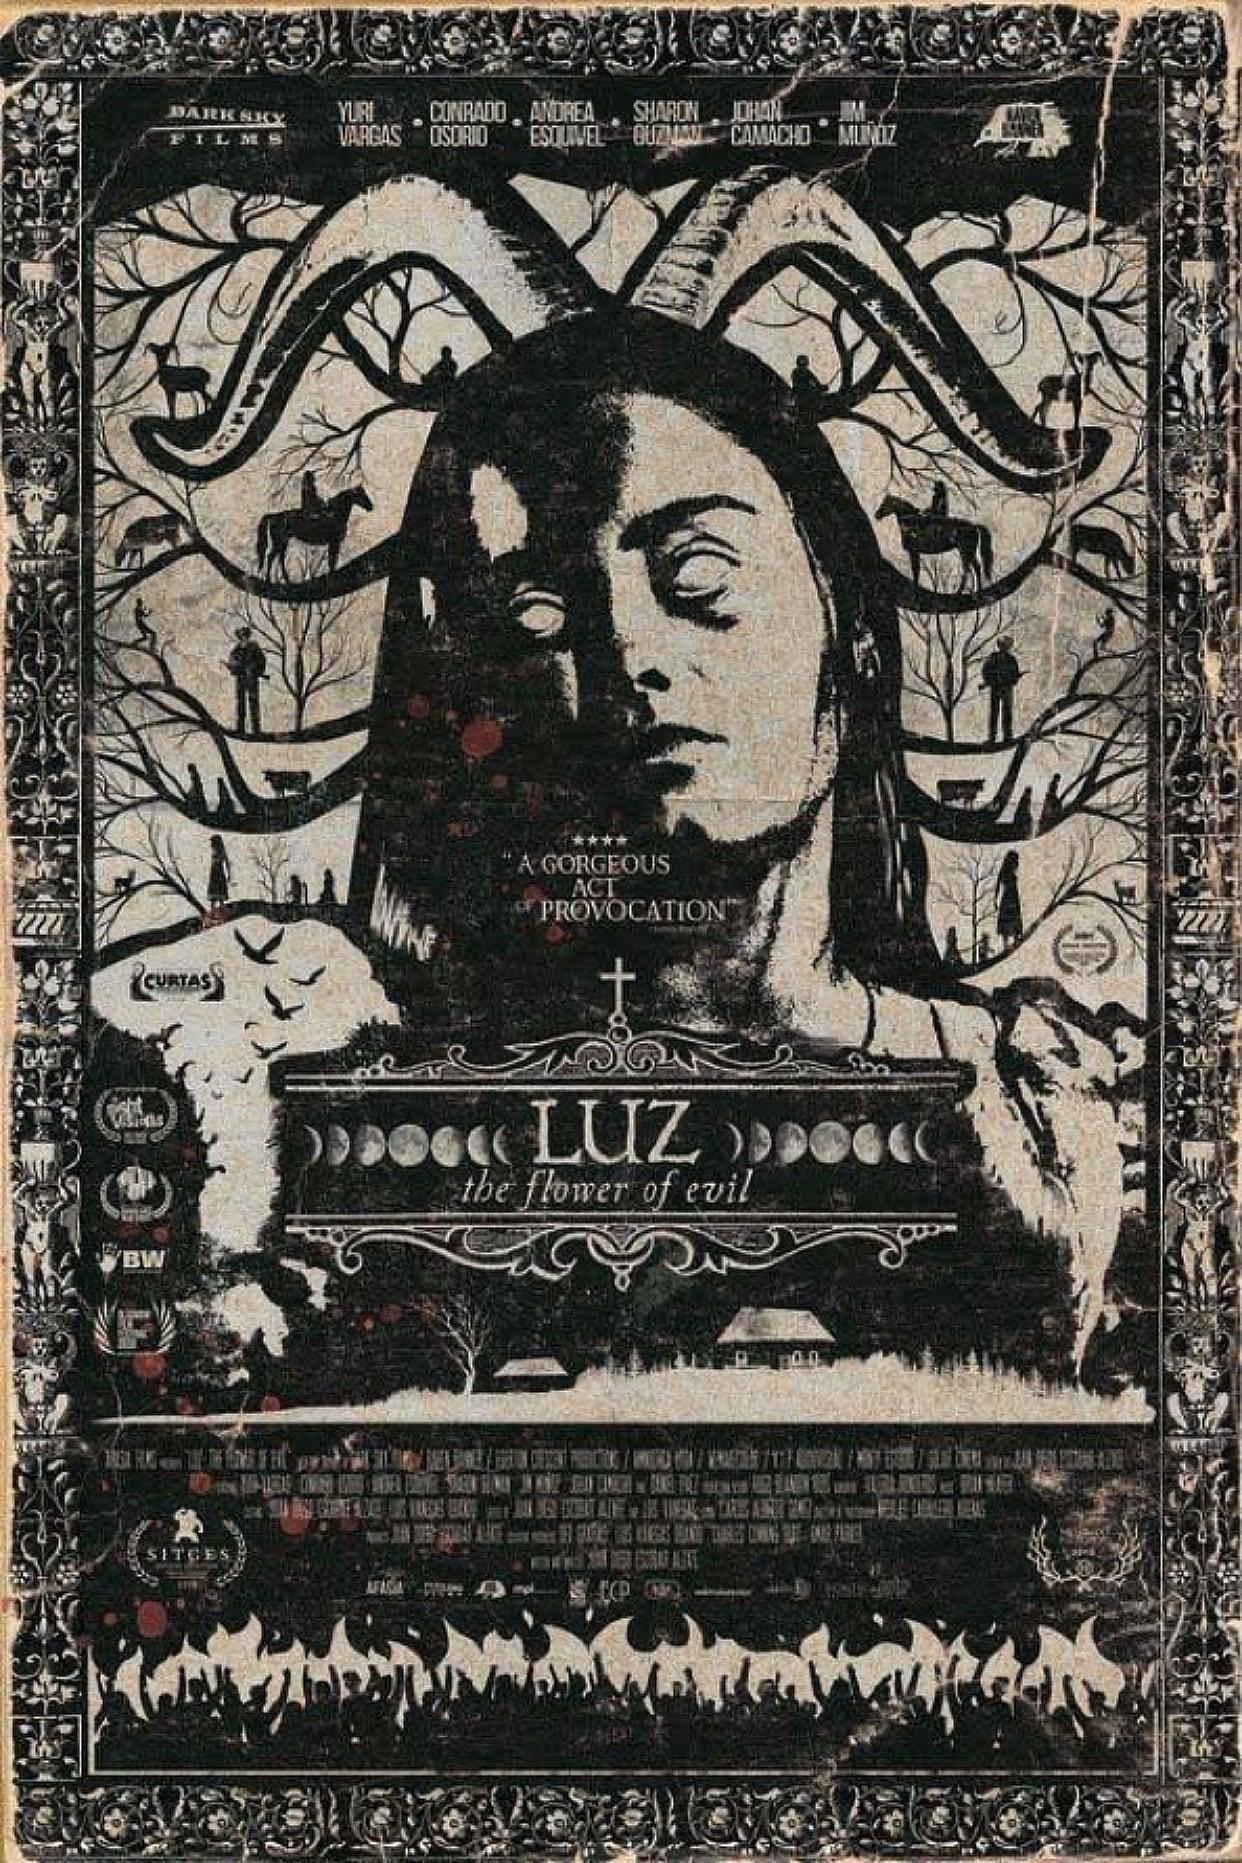 LUZ-THE FLOWER OF EVIL